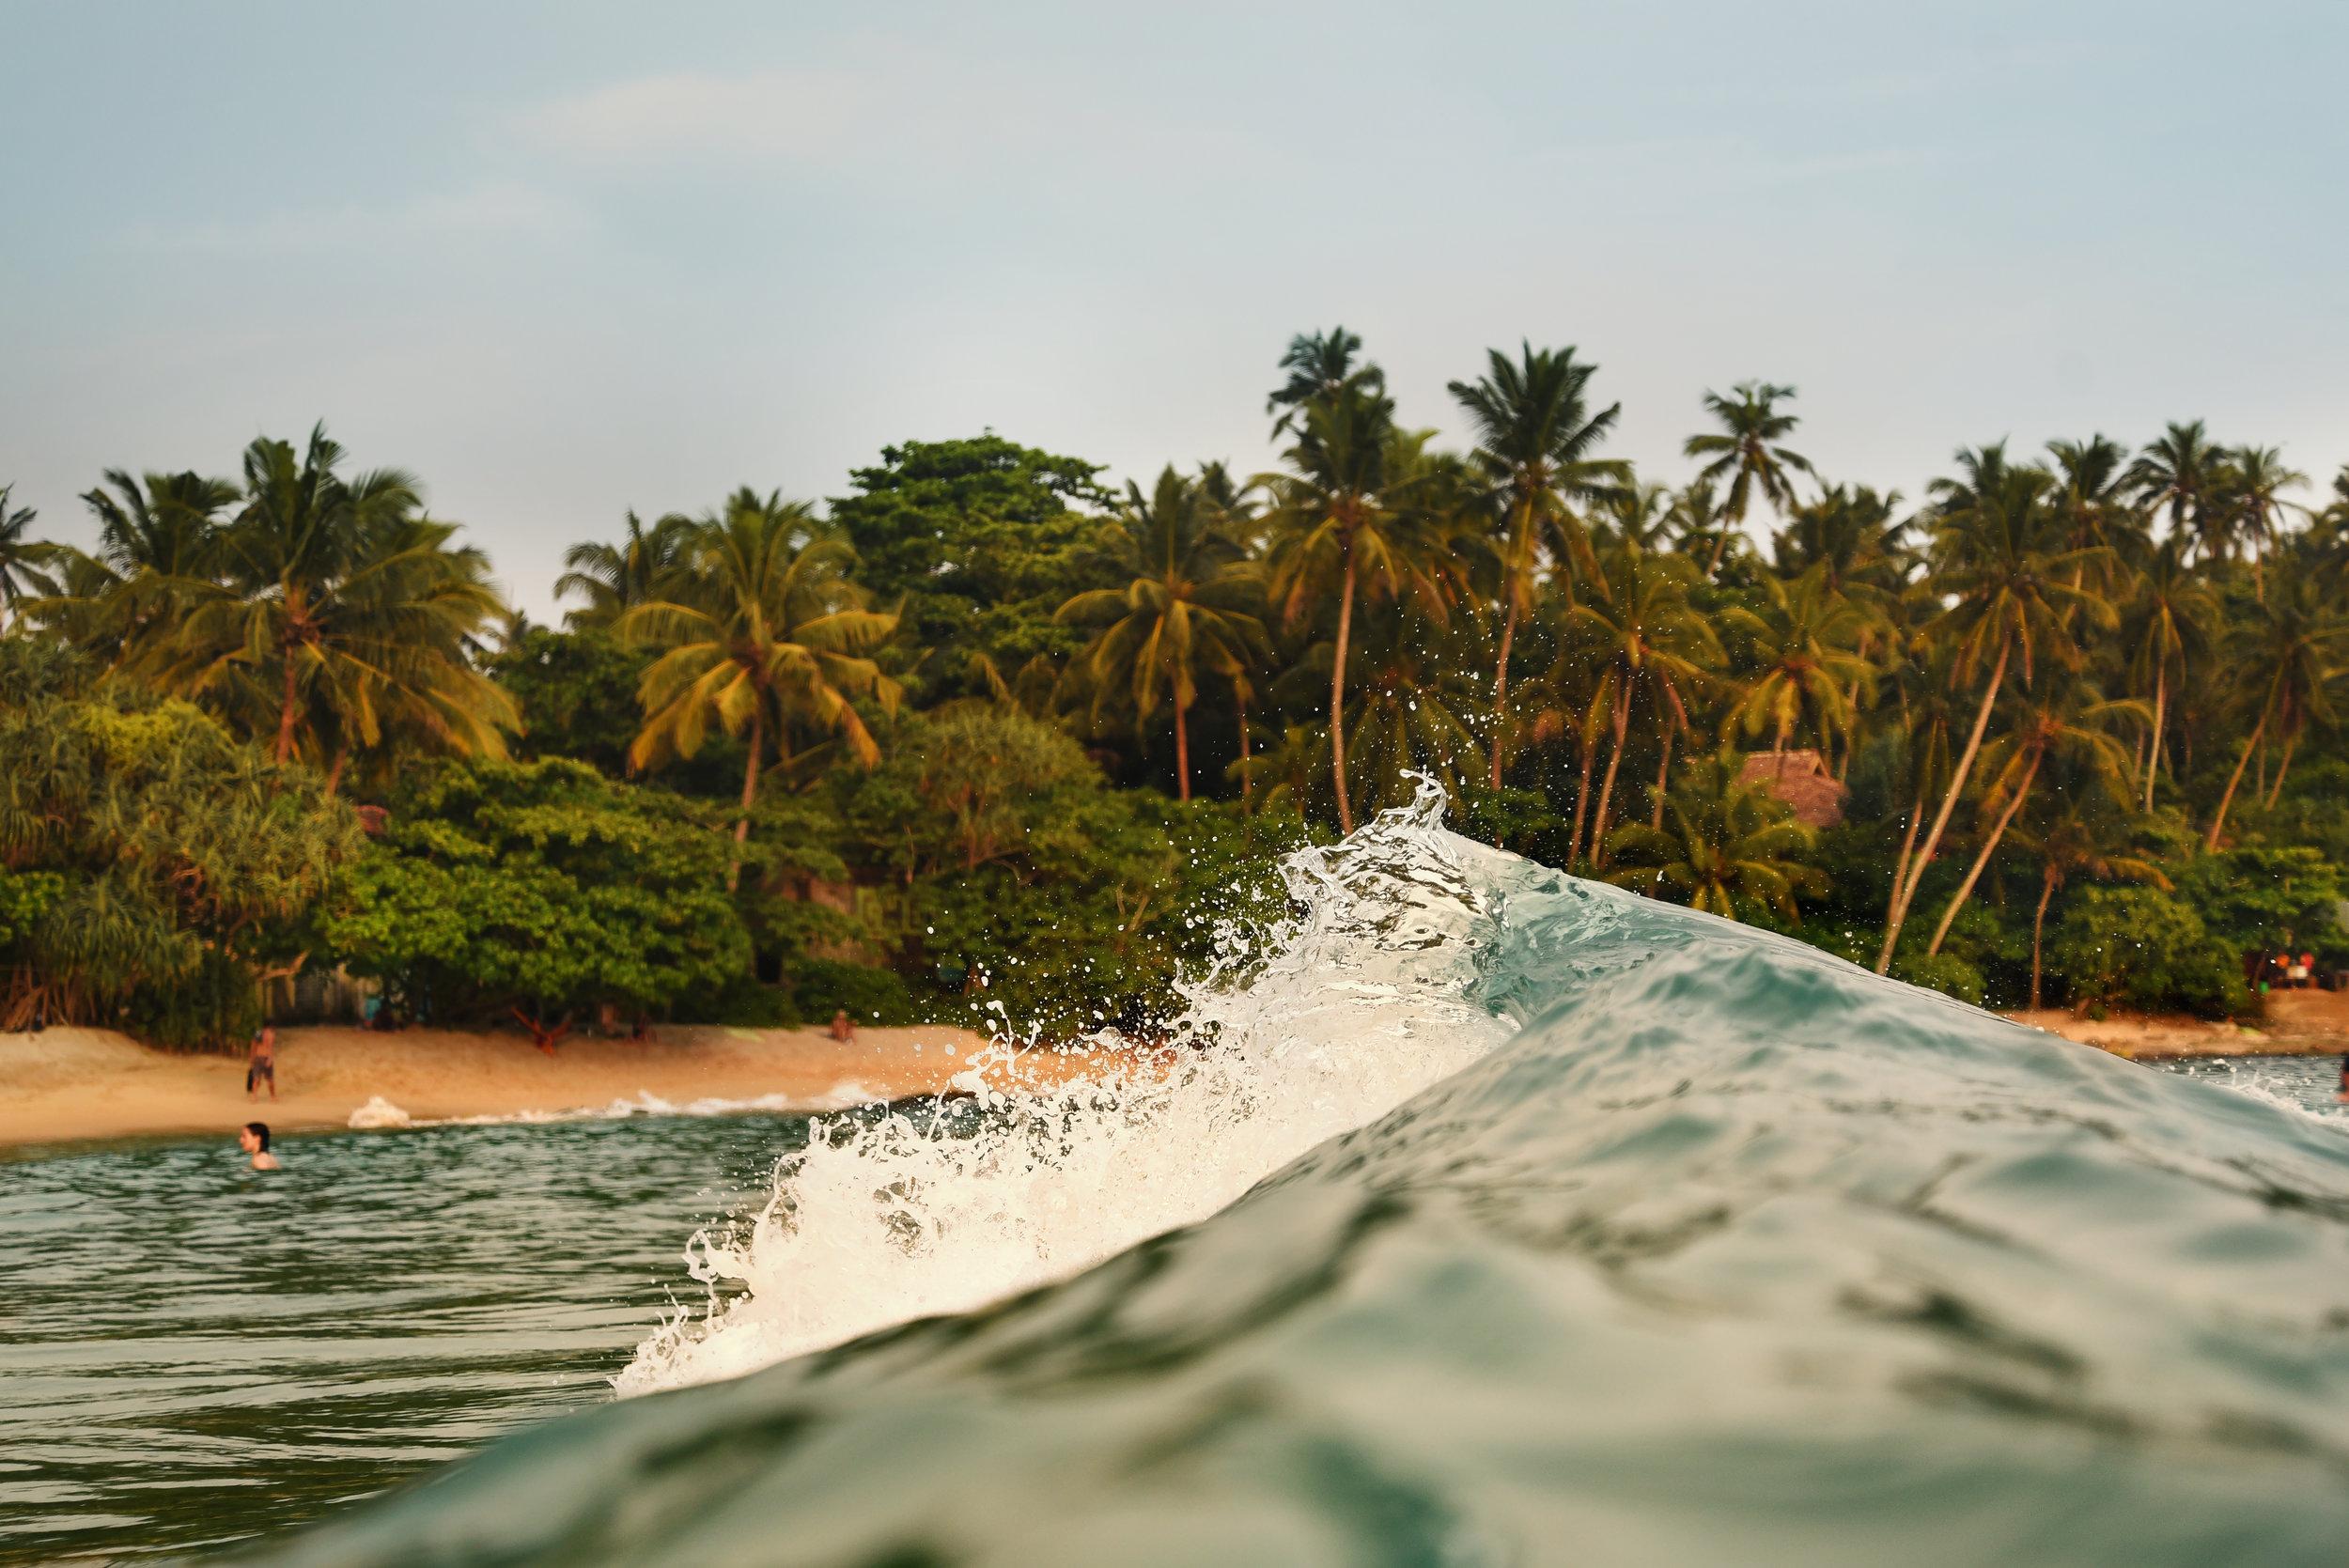 Wave art in Hiriketiya Sri Lanka